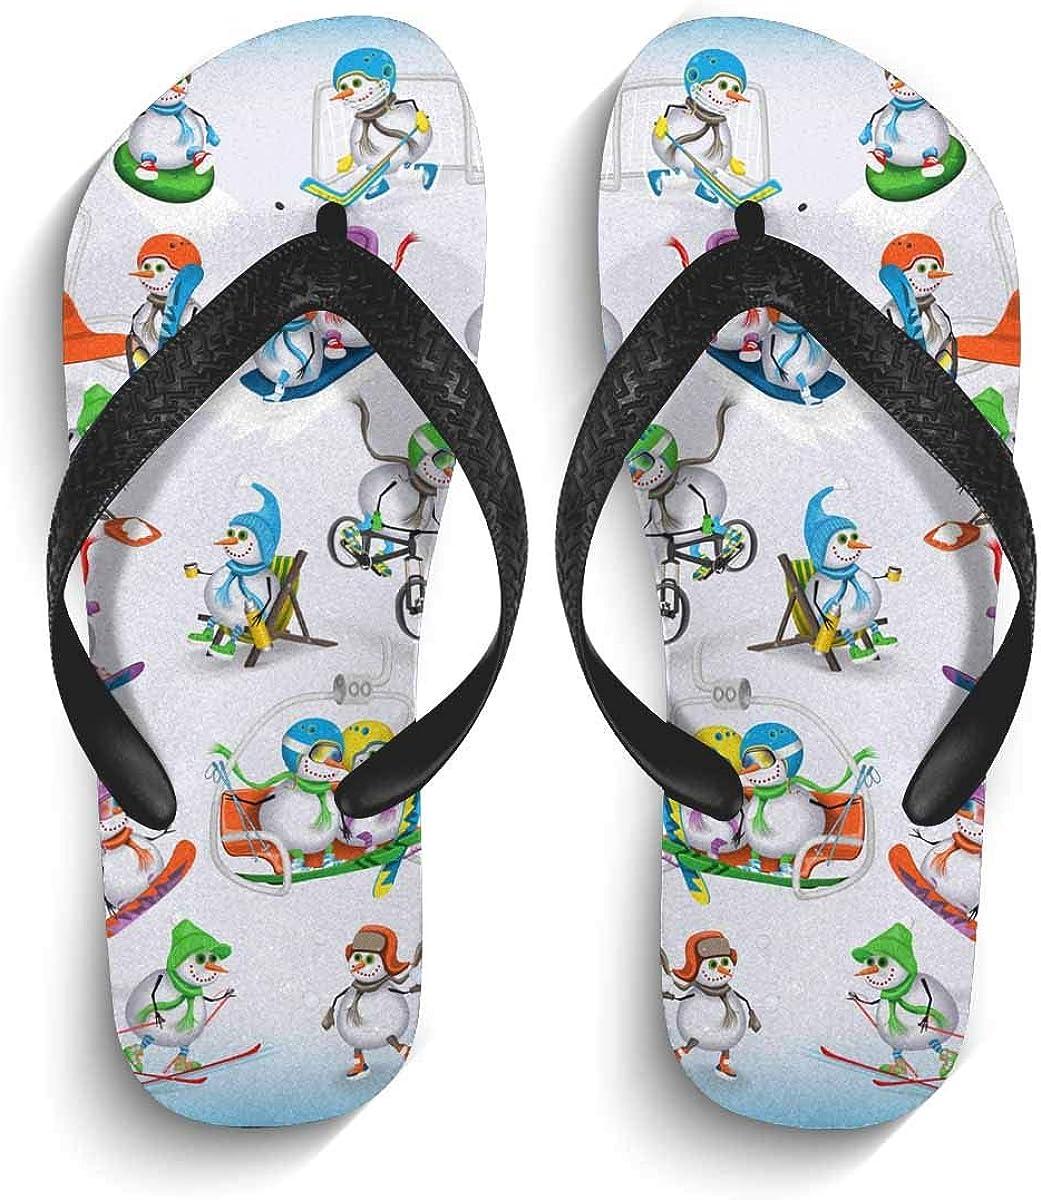 INTERESTPRINT Men's Non-Slip Flip Flop Slippers Snowman Winter Christmas Landscape Beach Thong Sandal